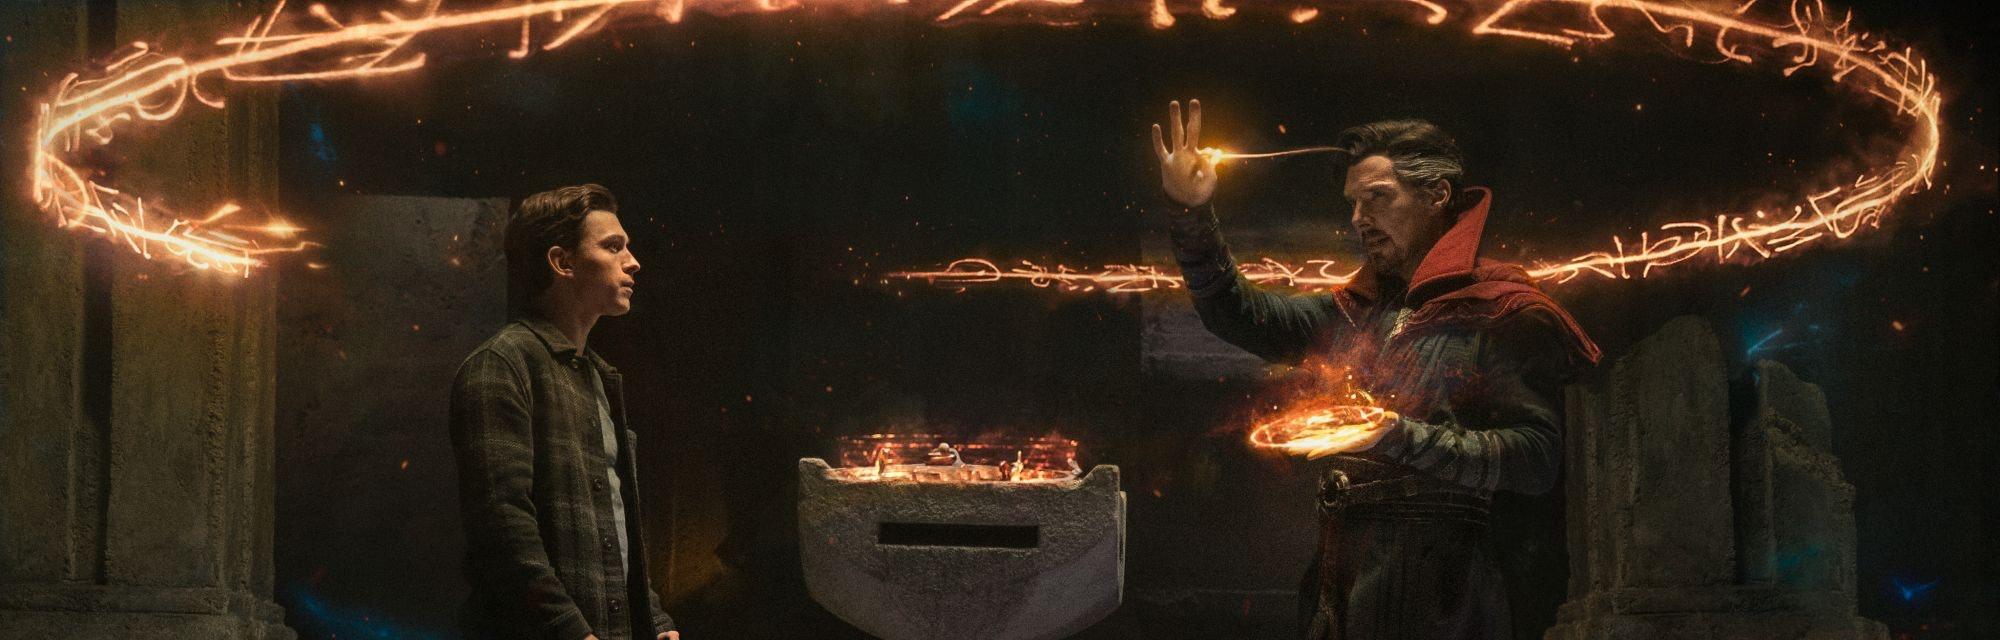 Doctor Strange 2: 'Spider-Man 3' trailer is concealing a massive twist